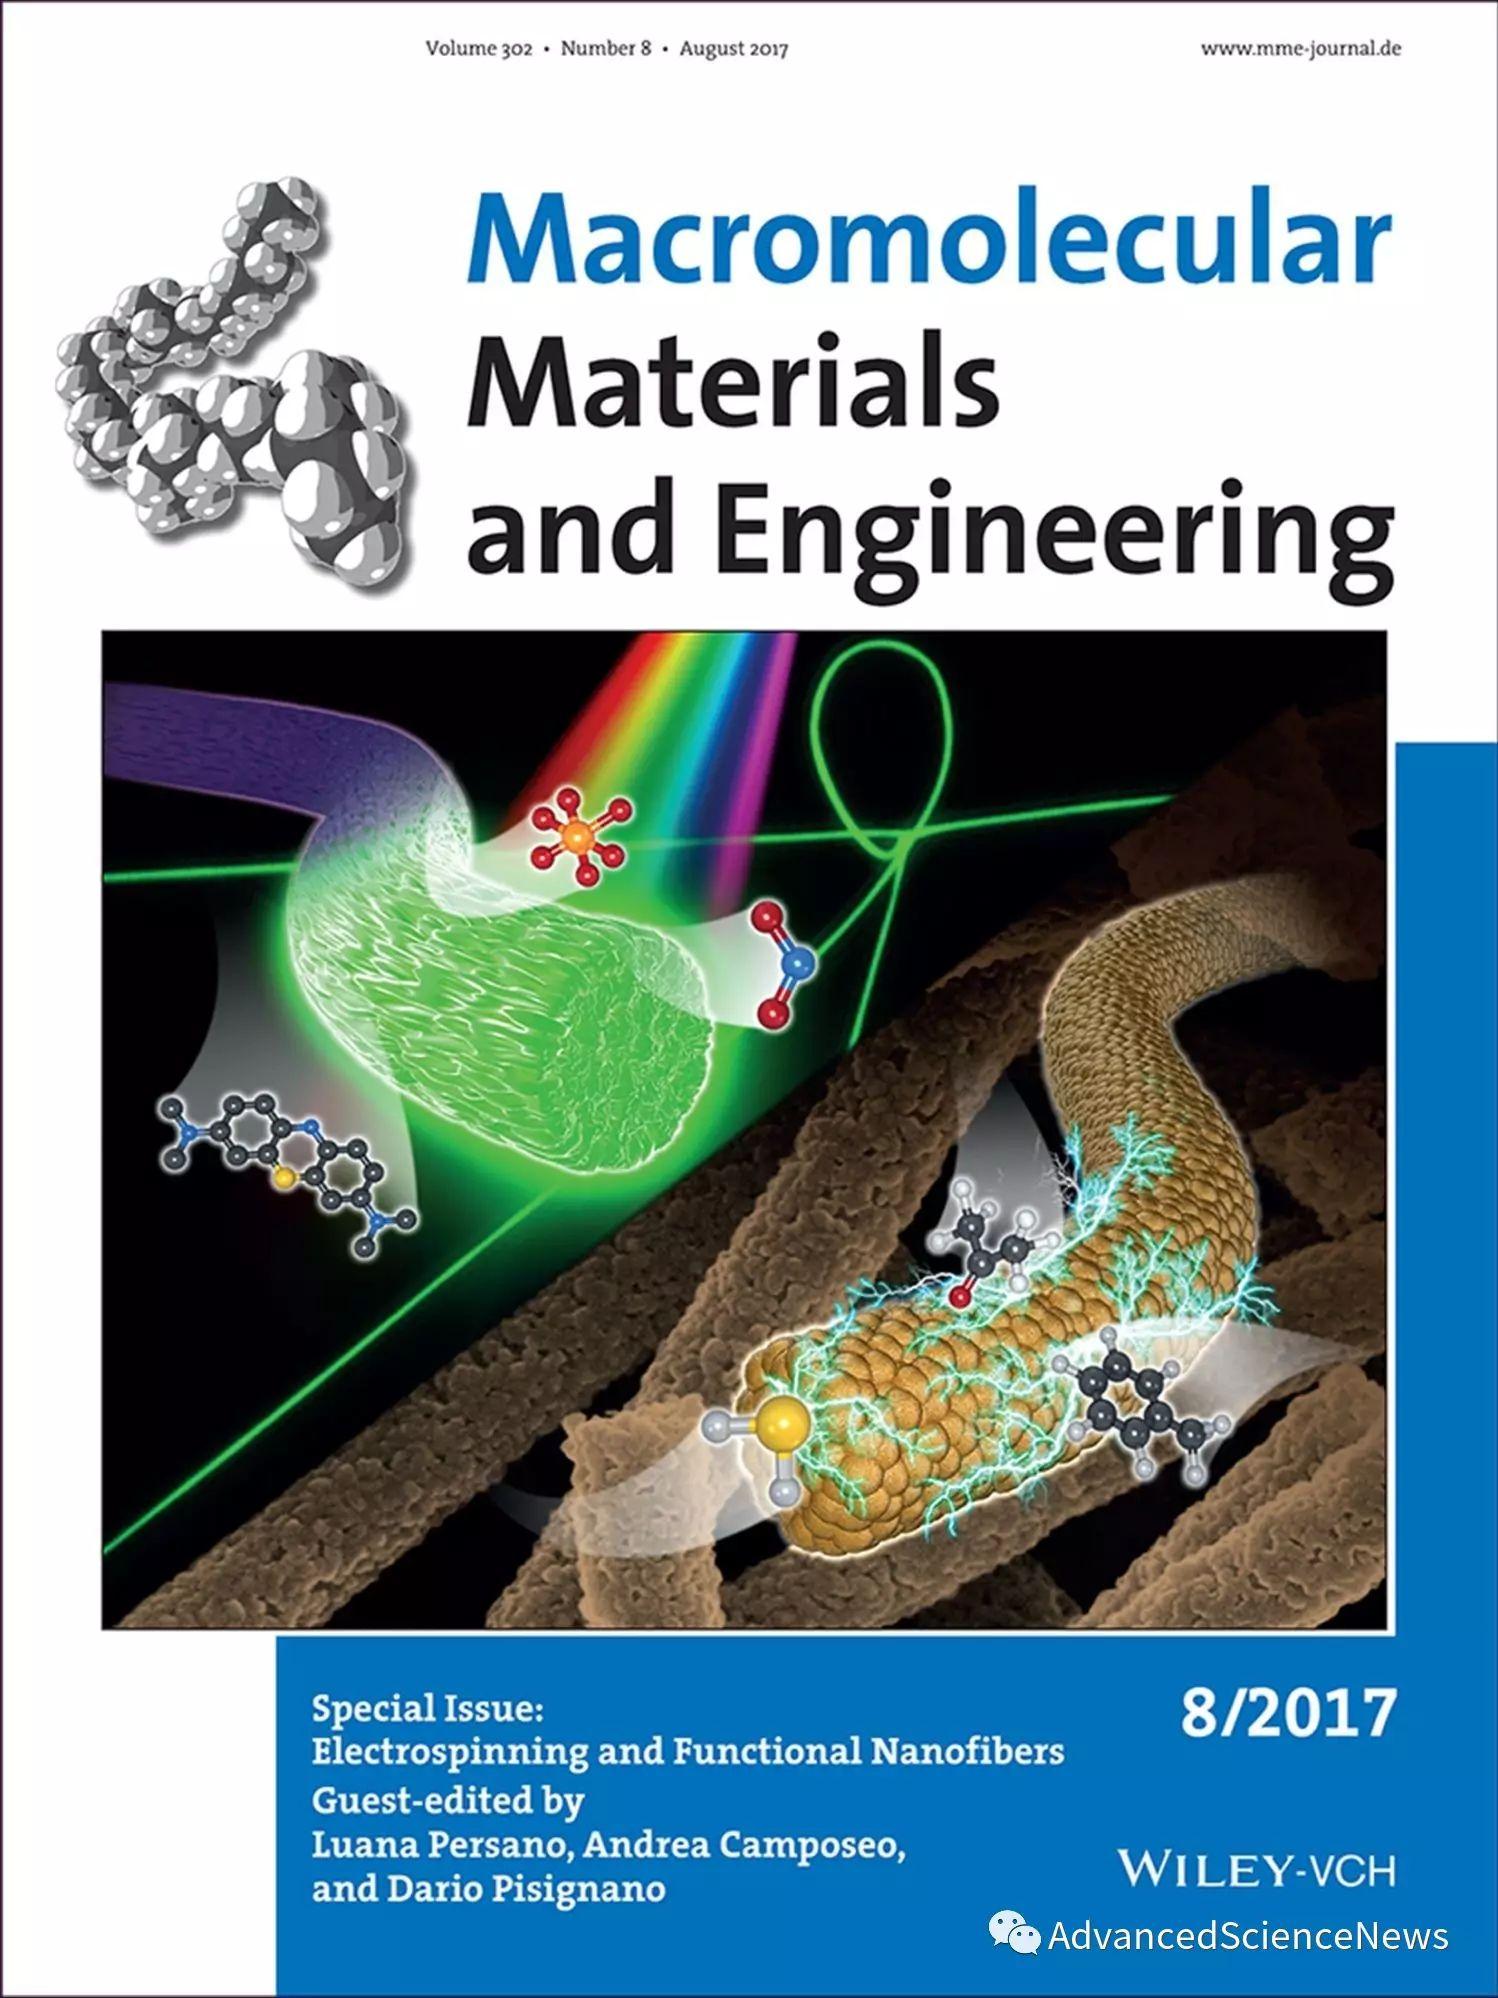 Macromolecular Materials and Engineering最新专刊:电纺纤维和功能纤维最新进展